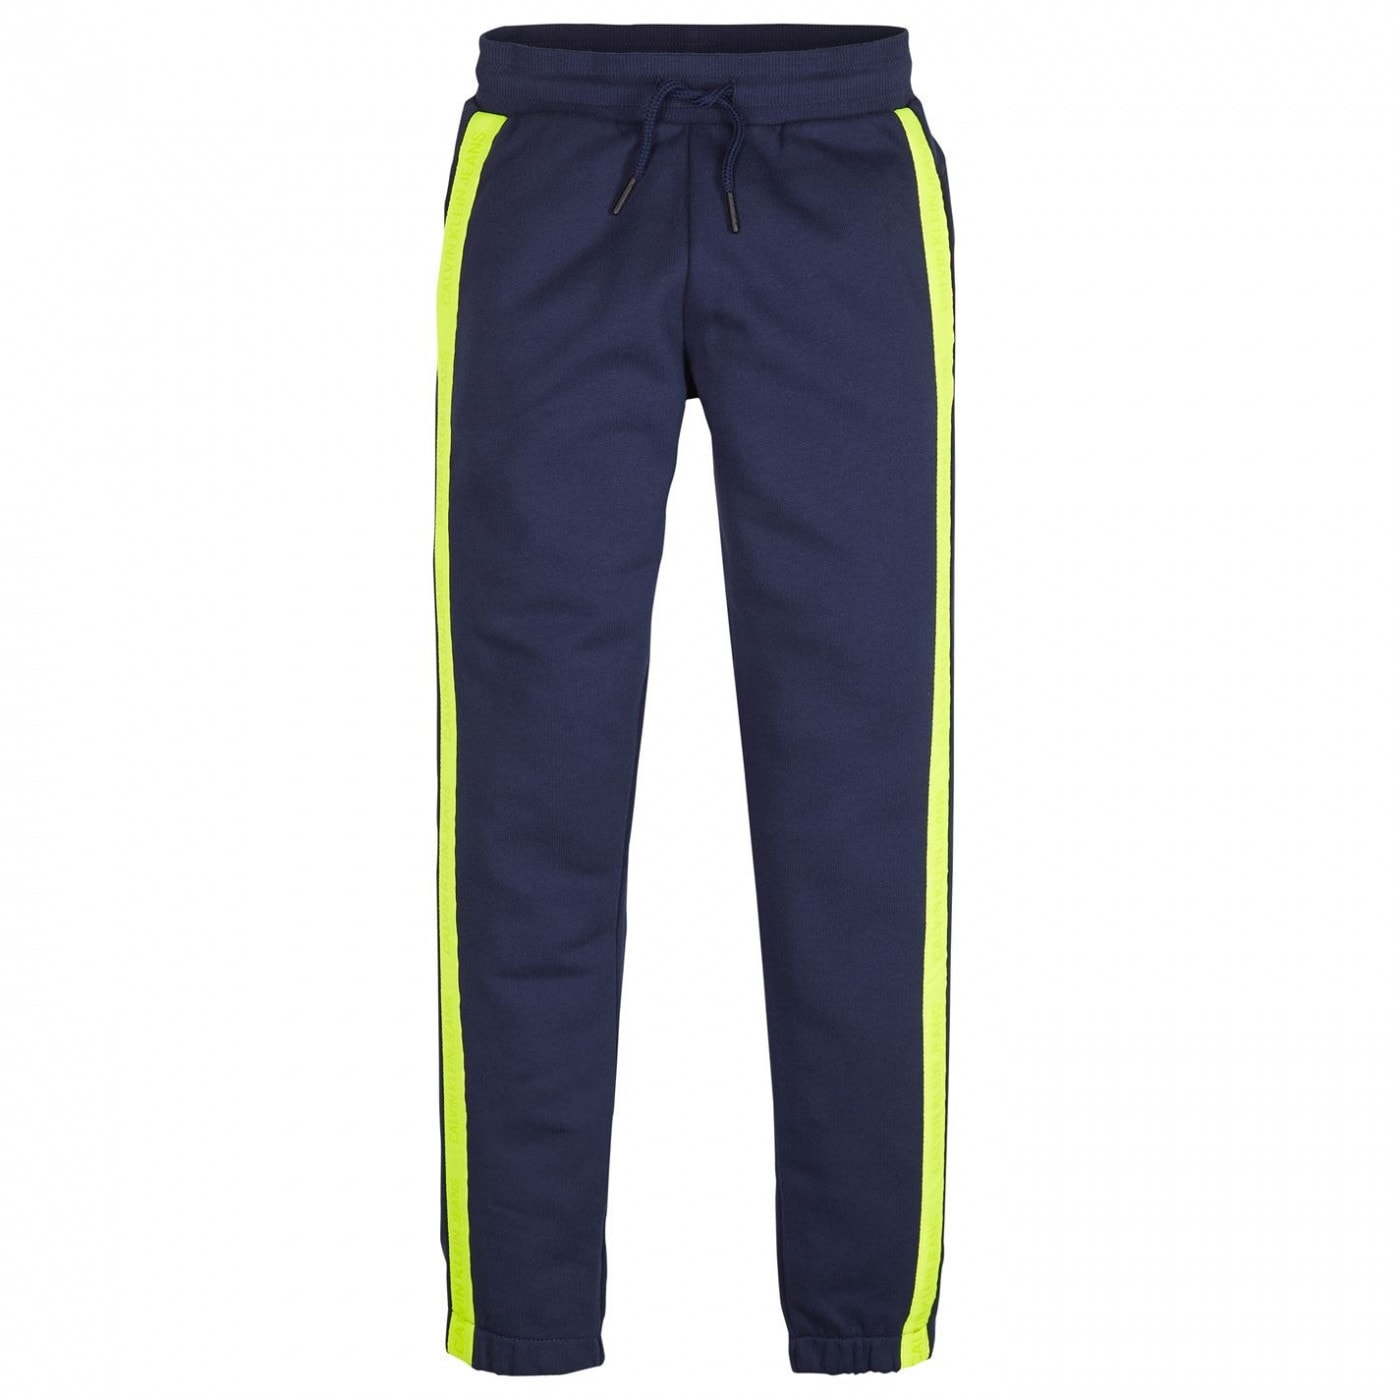 Calvin Klein Jeans Neon Tape Jogging Bottoms